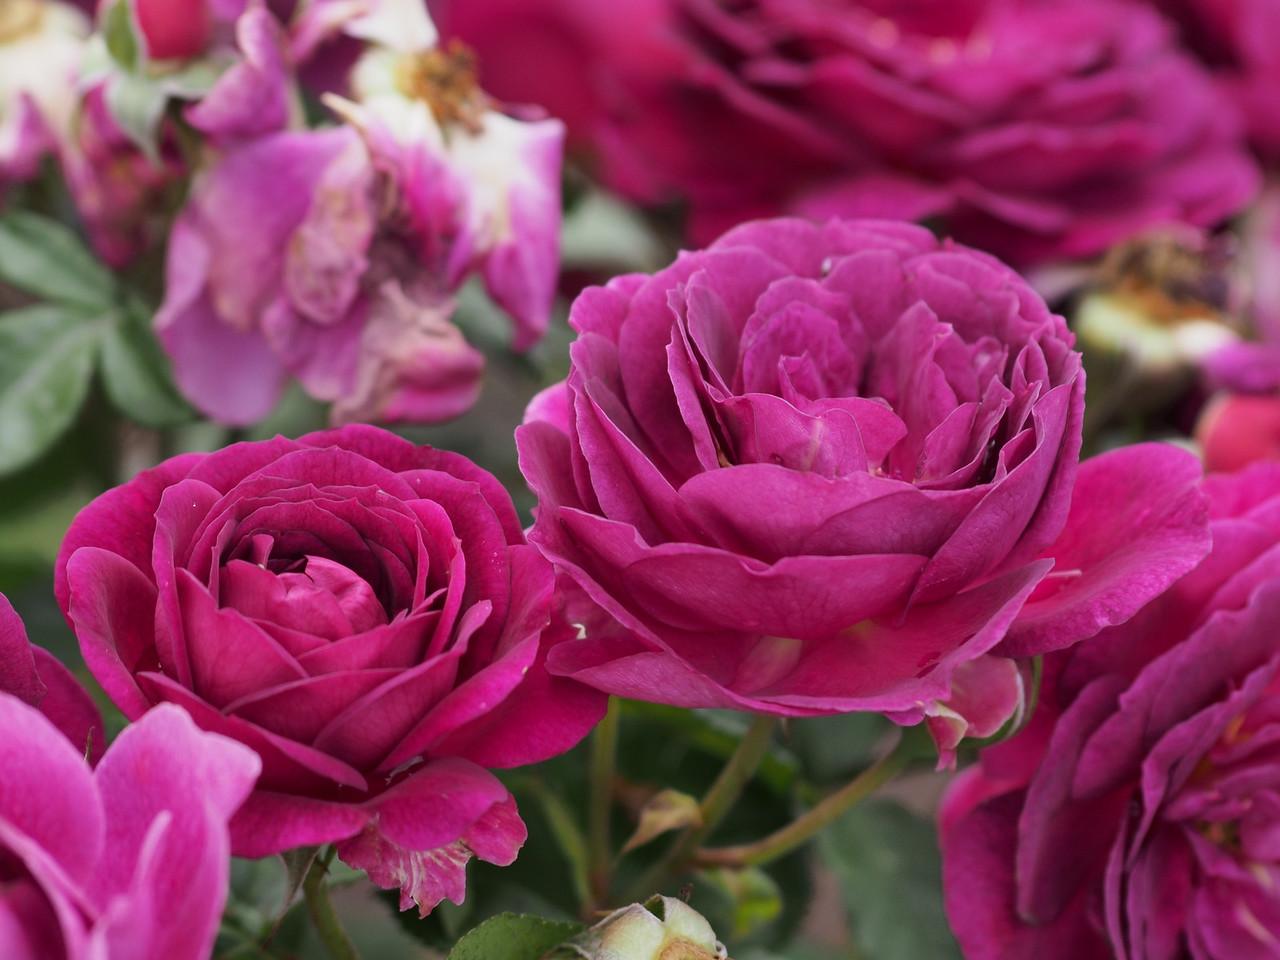 20131227_1011_1042 roses (State Rose Garden, Werribee)